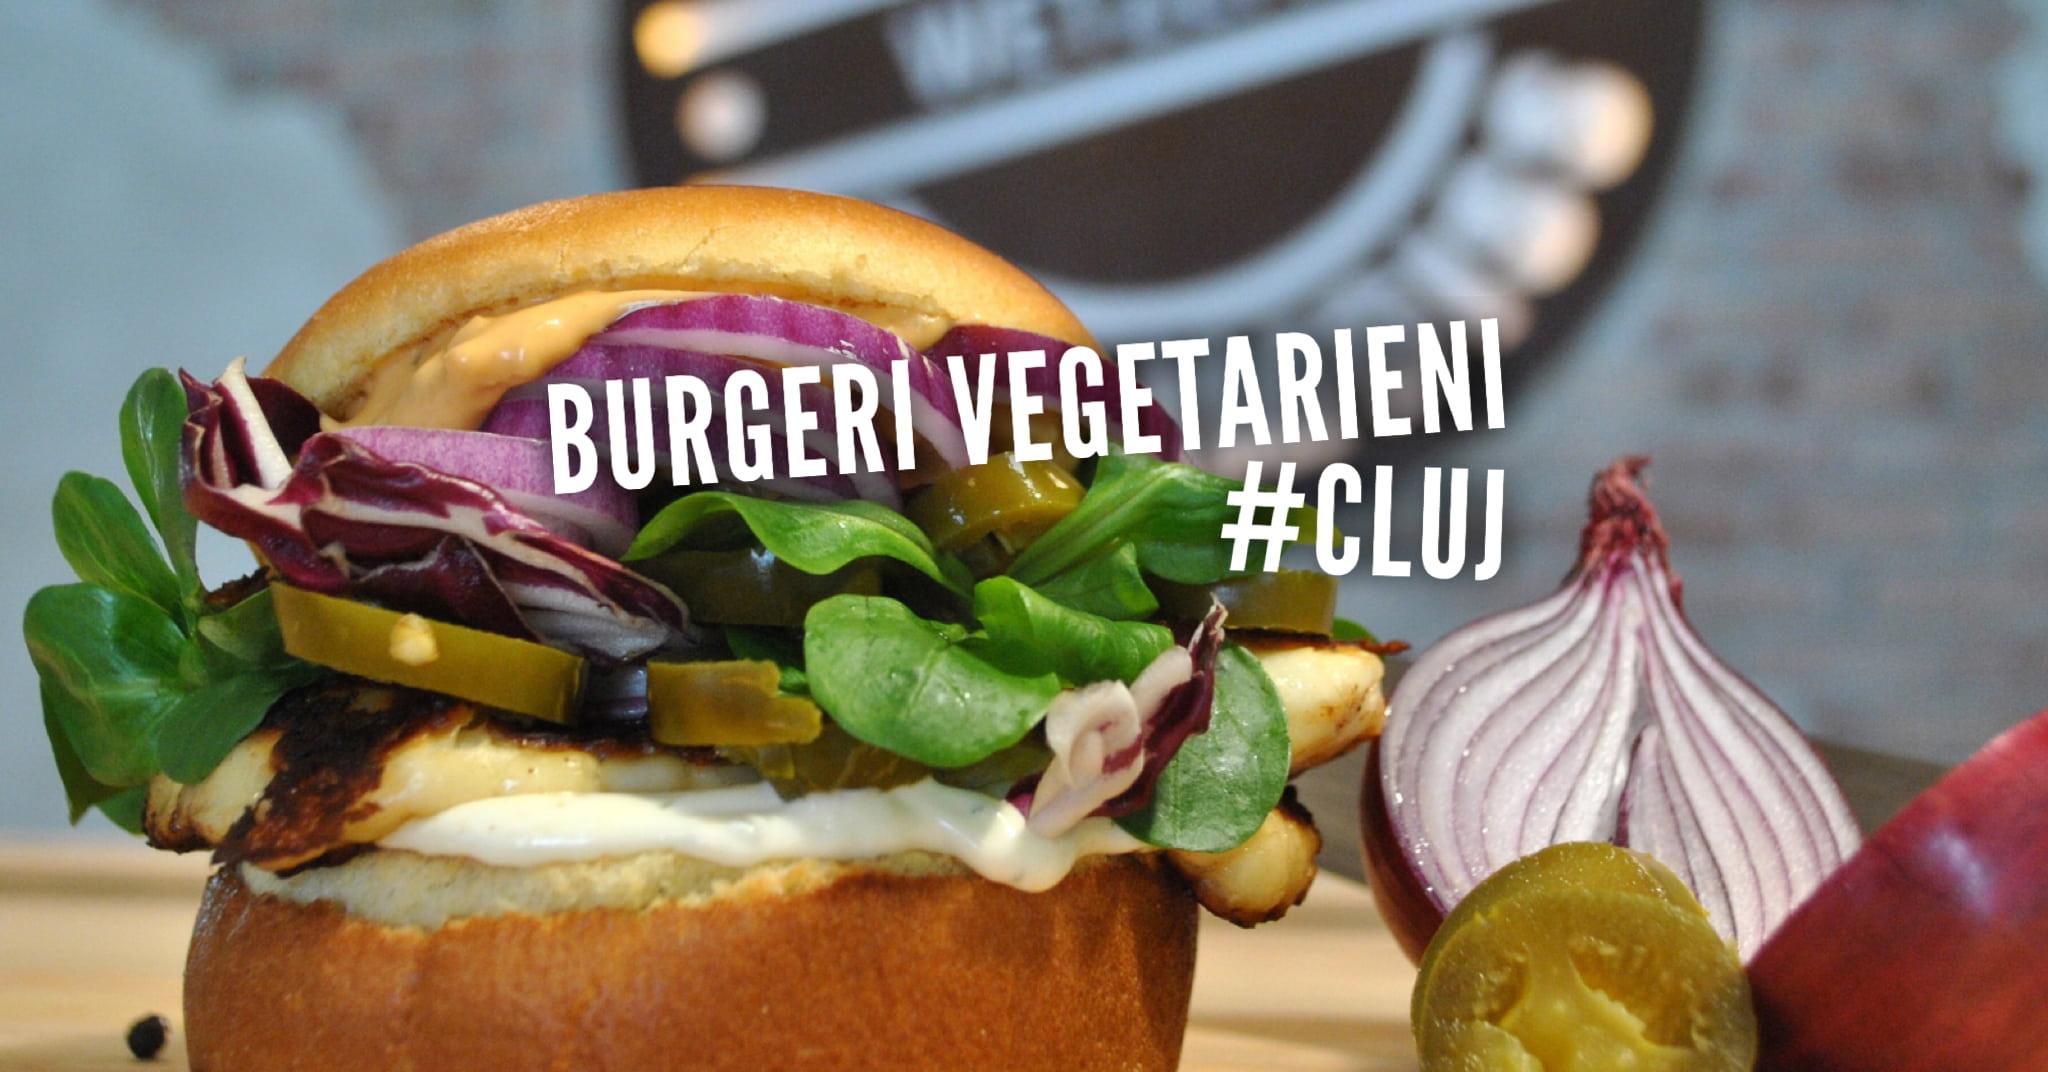 Cei mai buni burgeri vegetarieni din Cluj | #vegfoodiecluj